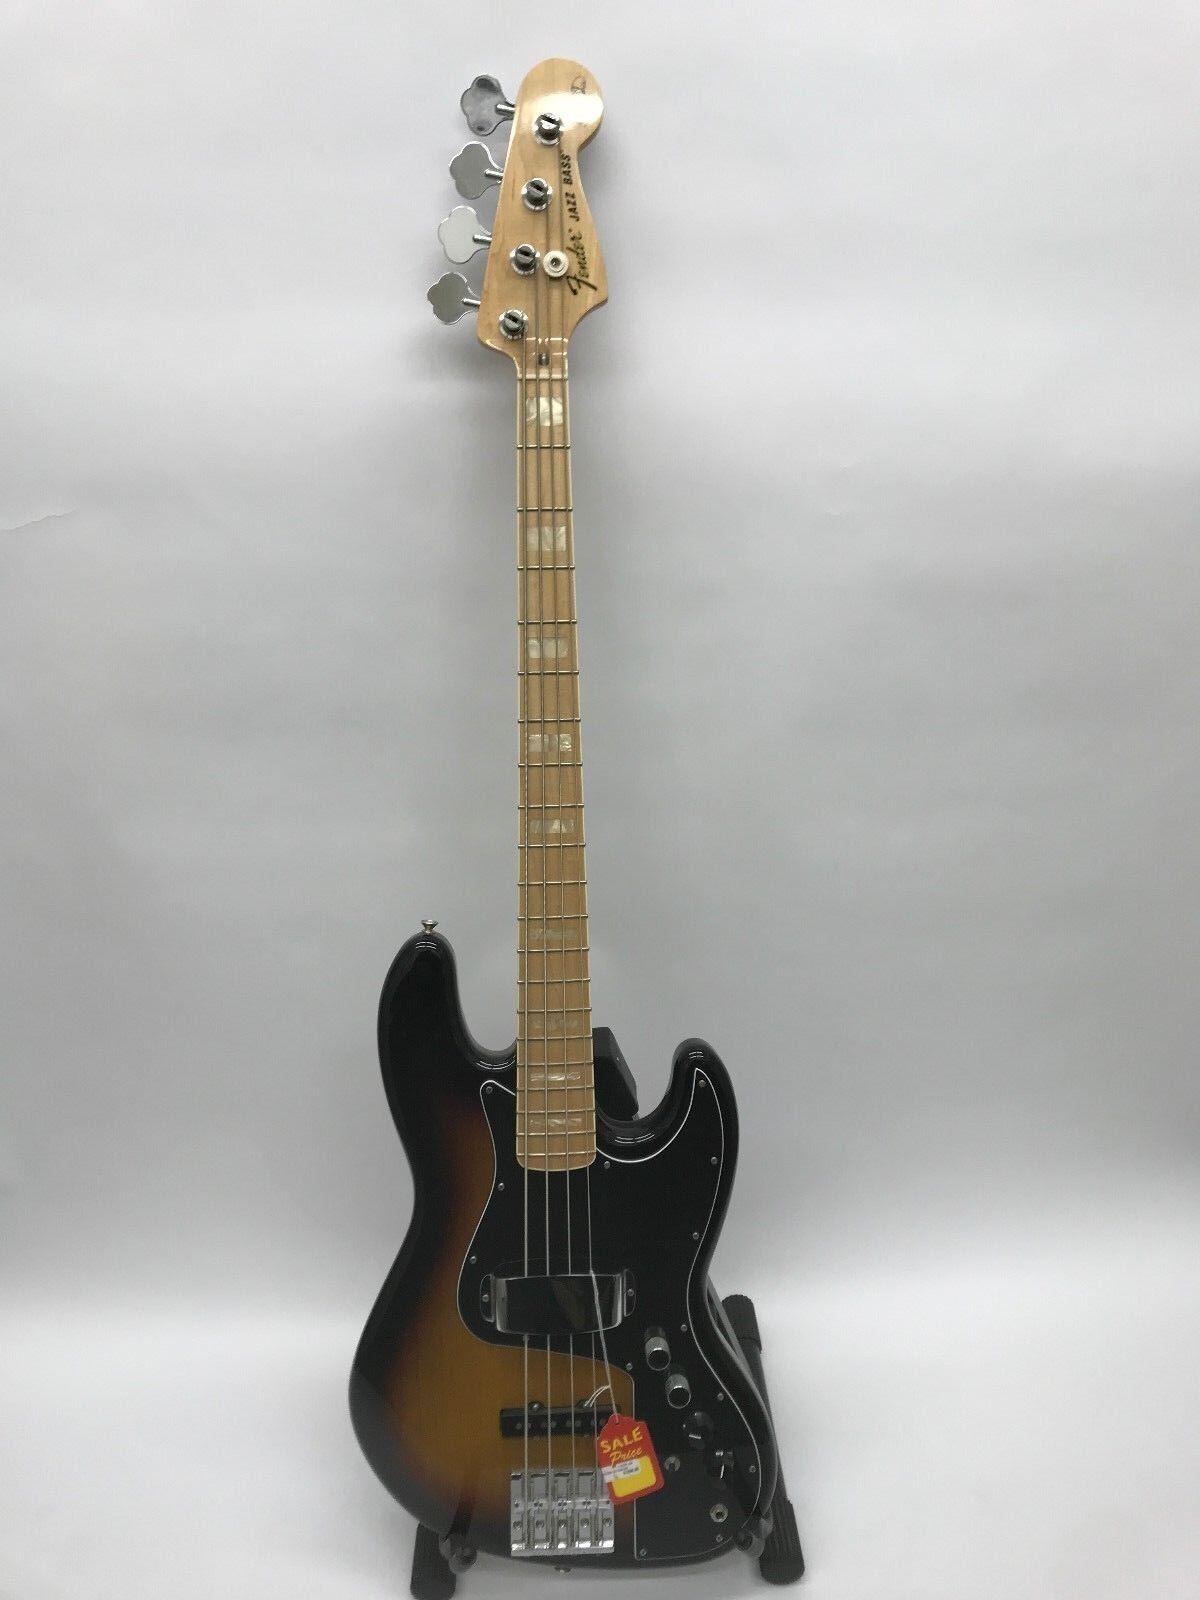 Fender jazz bass us pickups badass ii bridge sunburst bin